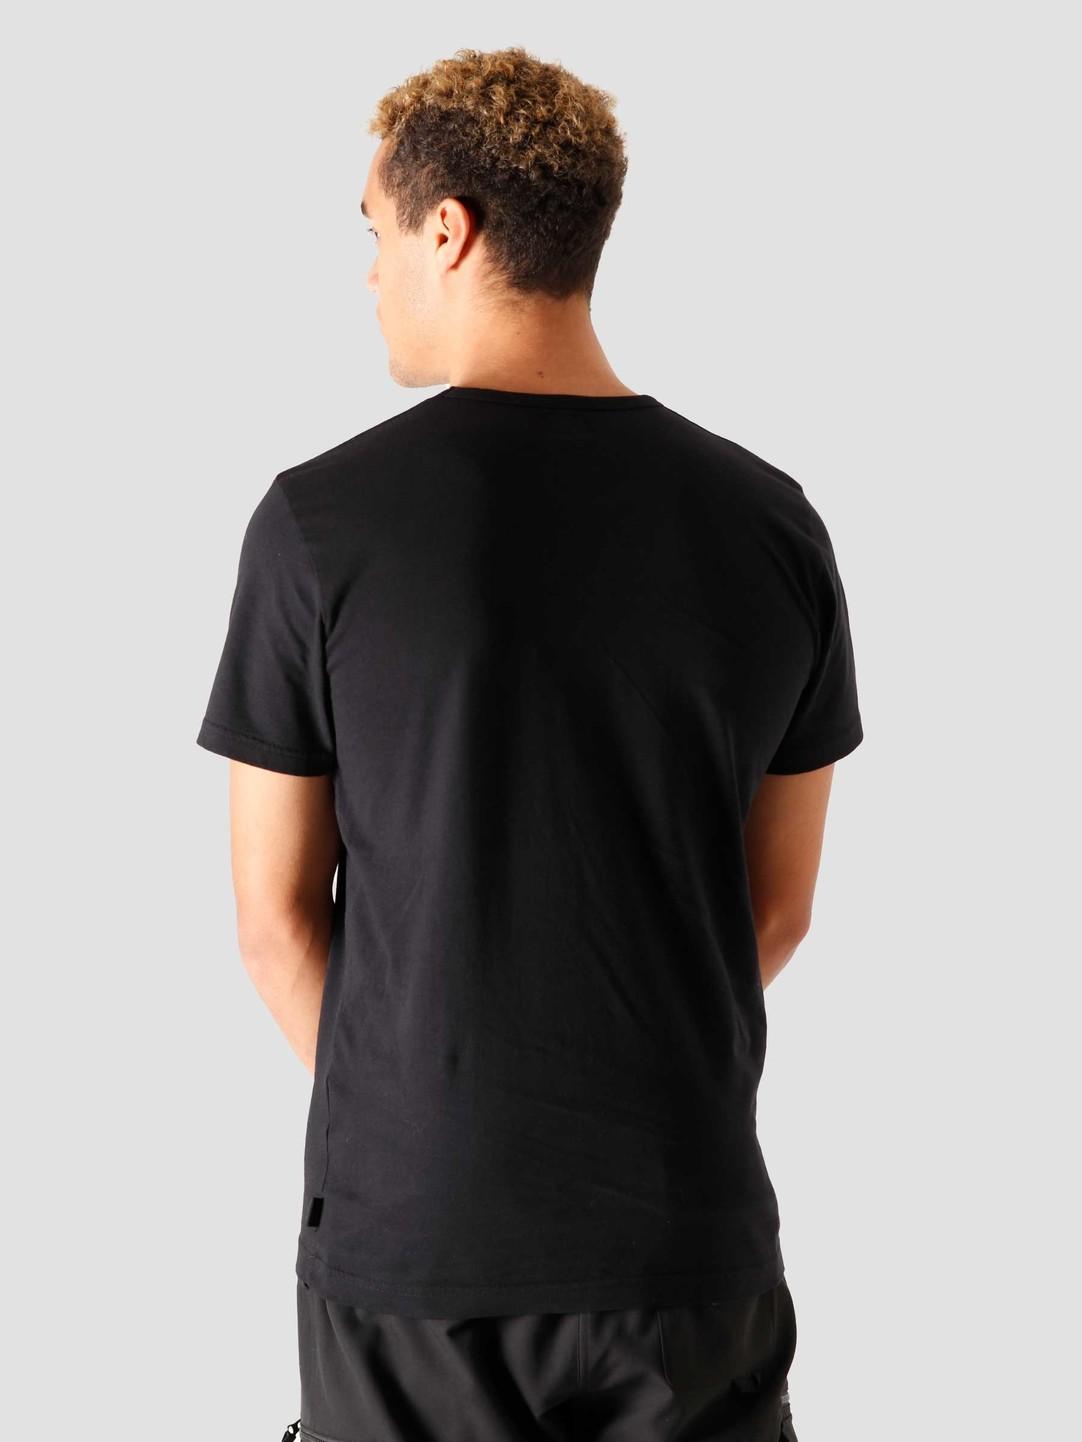 Ceizer Ceizer Fuck Off T-Shirt Black FW2020-007